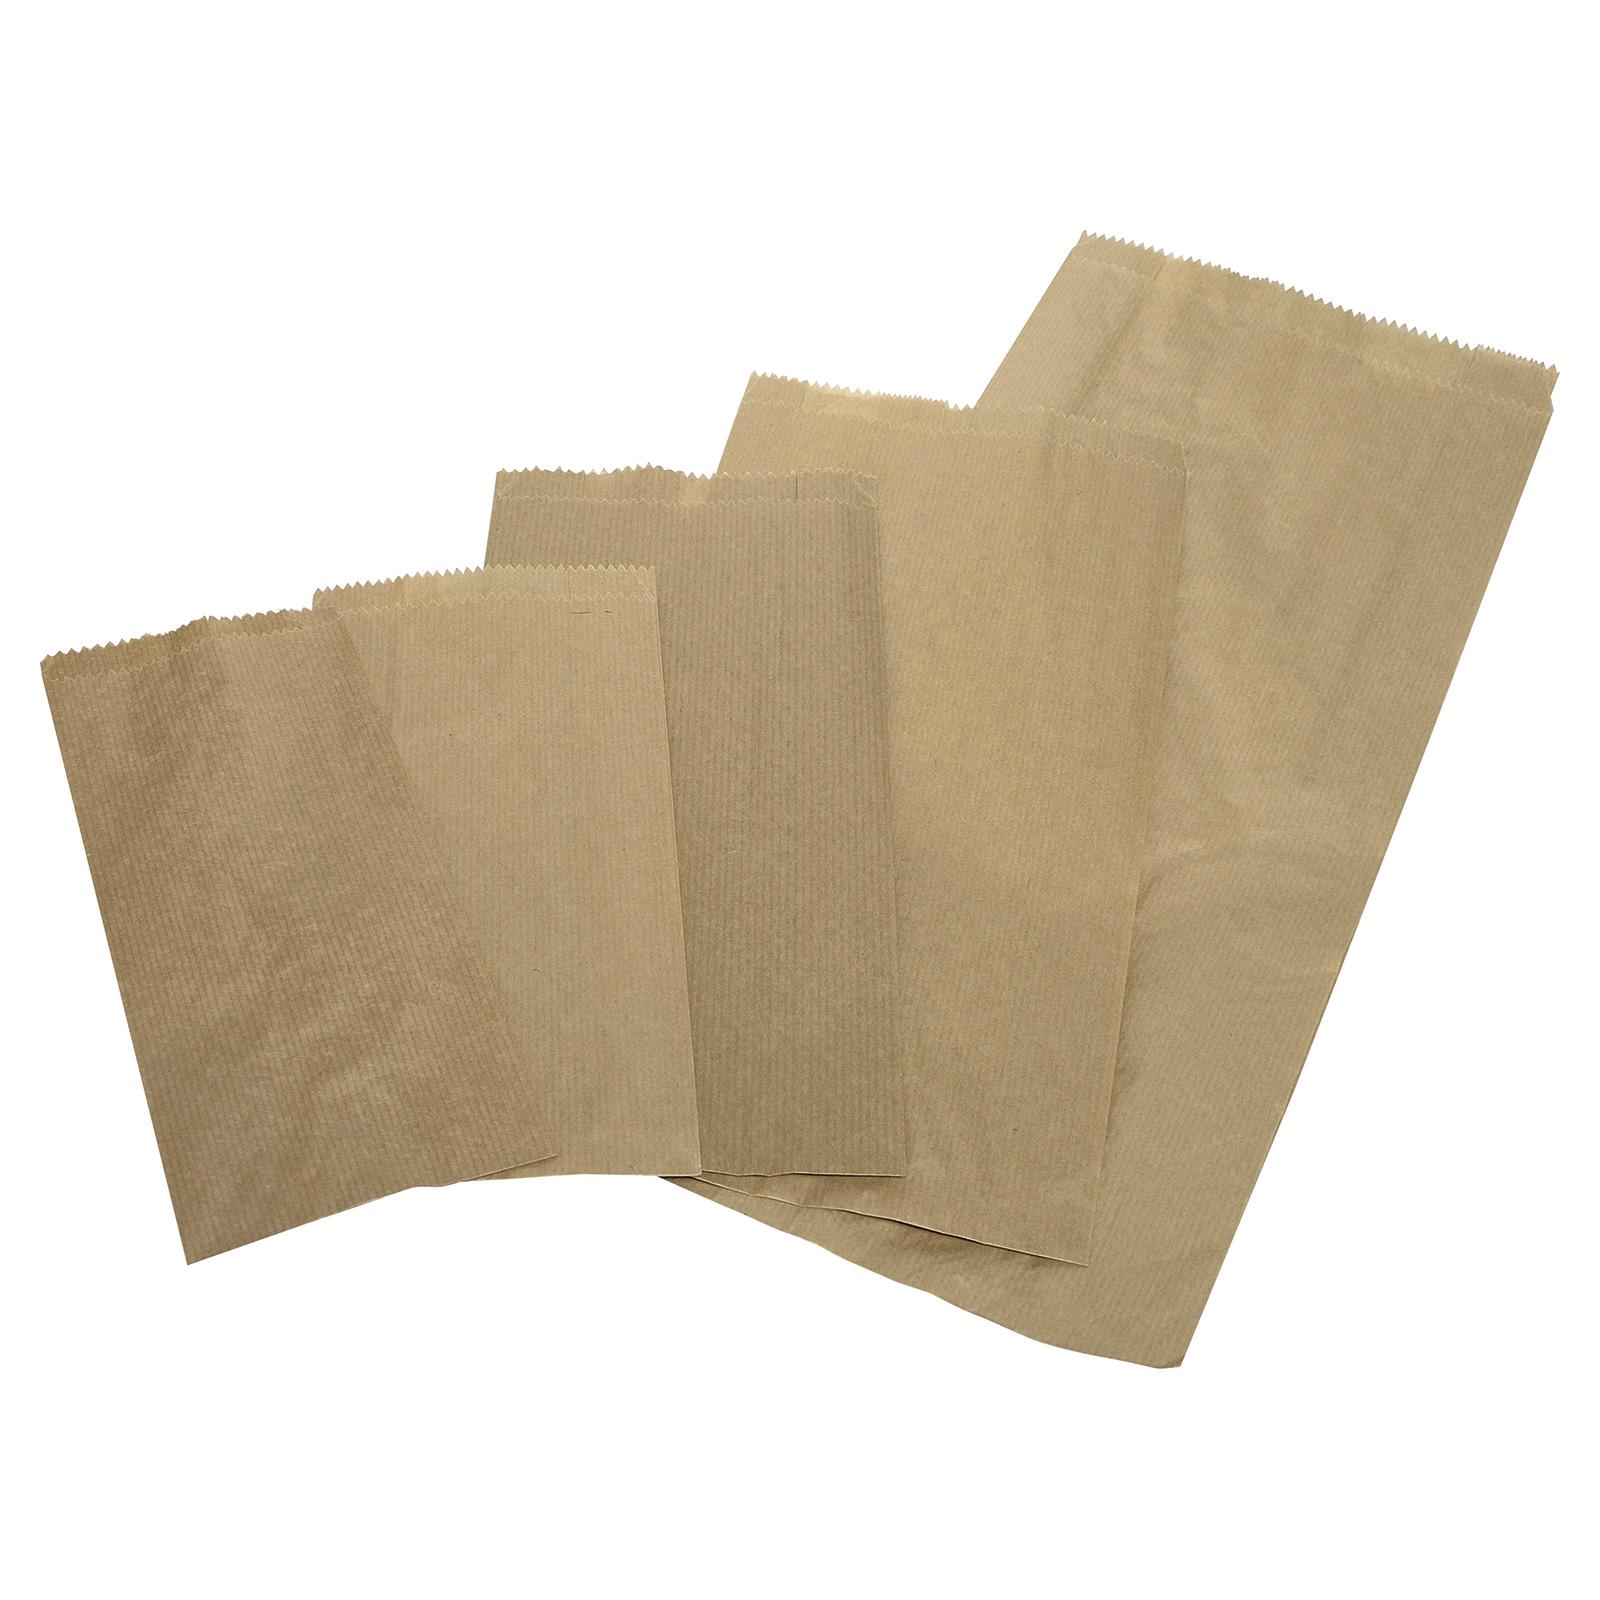 Flachbeutel braun Kraftpapier, VE 1000 Stück - Flachbeutel ...